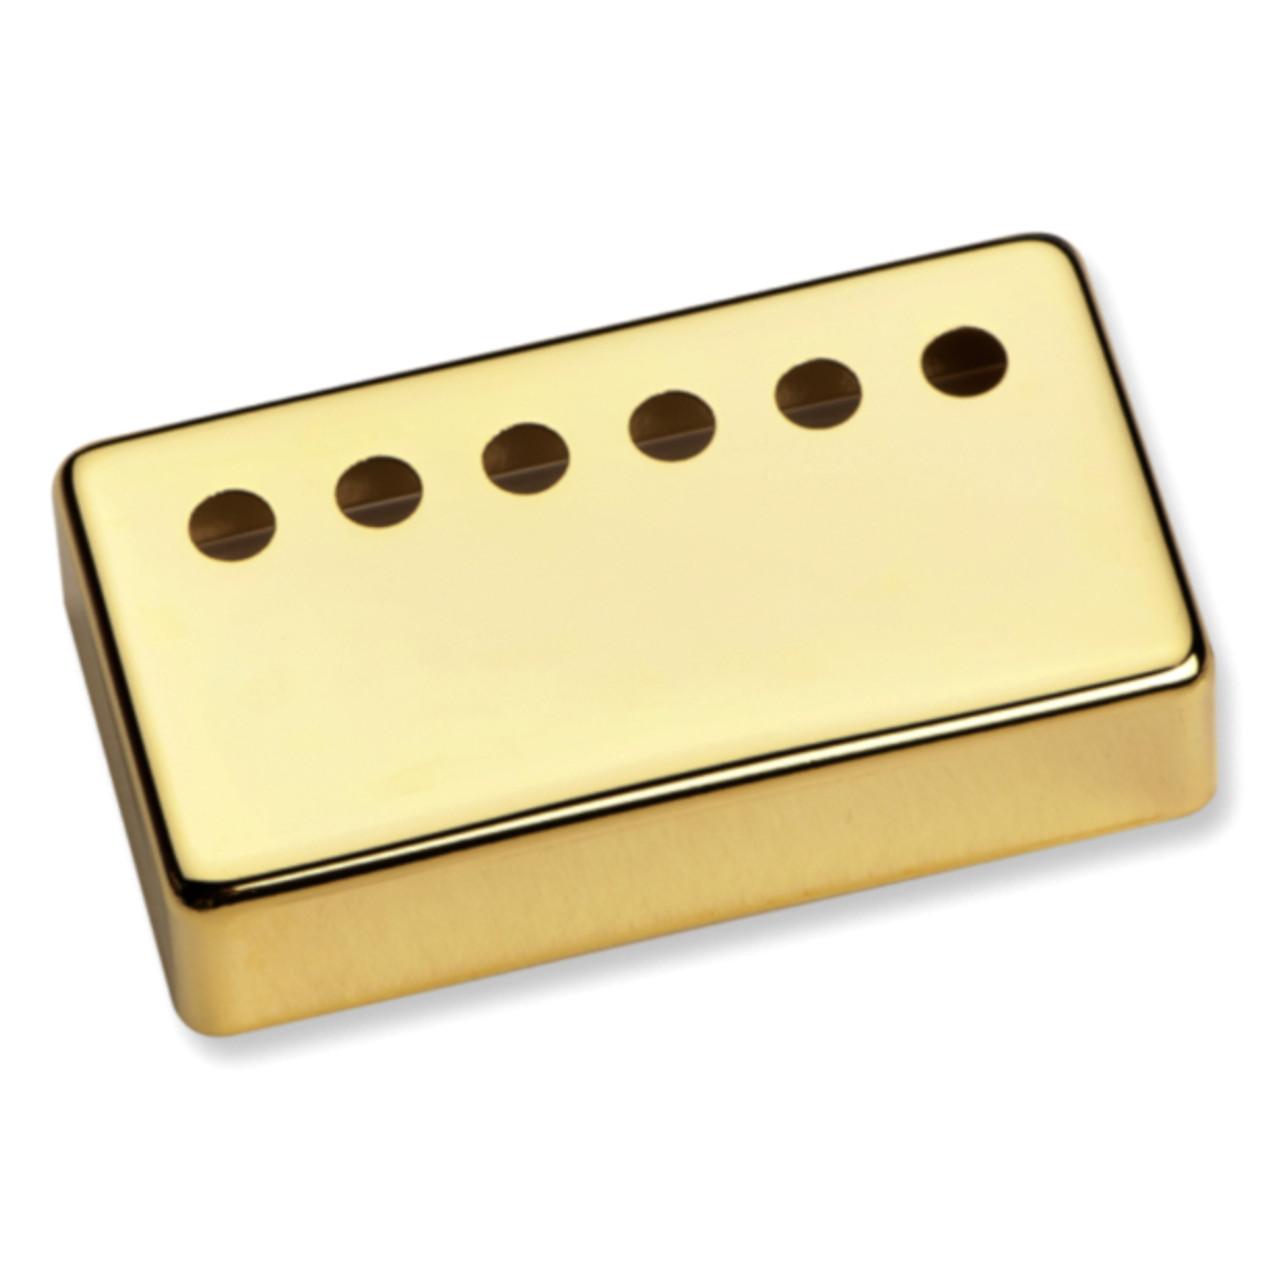 Seymour Duncan Metal Pickup Cover - Gold